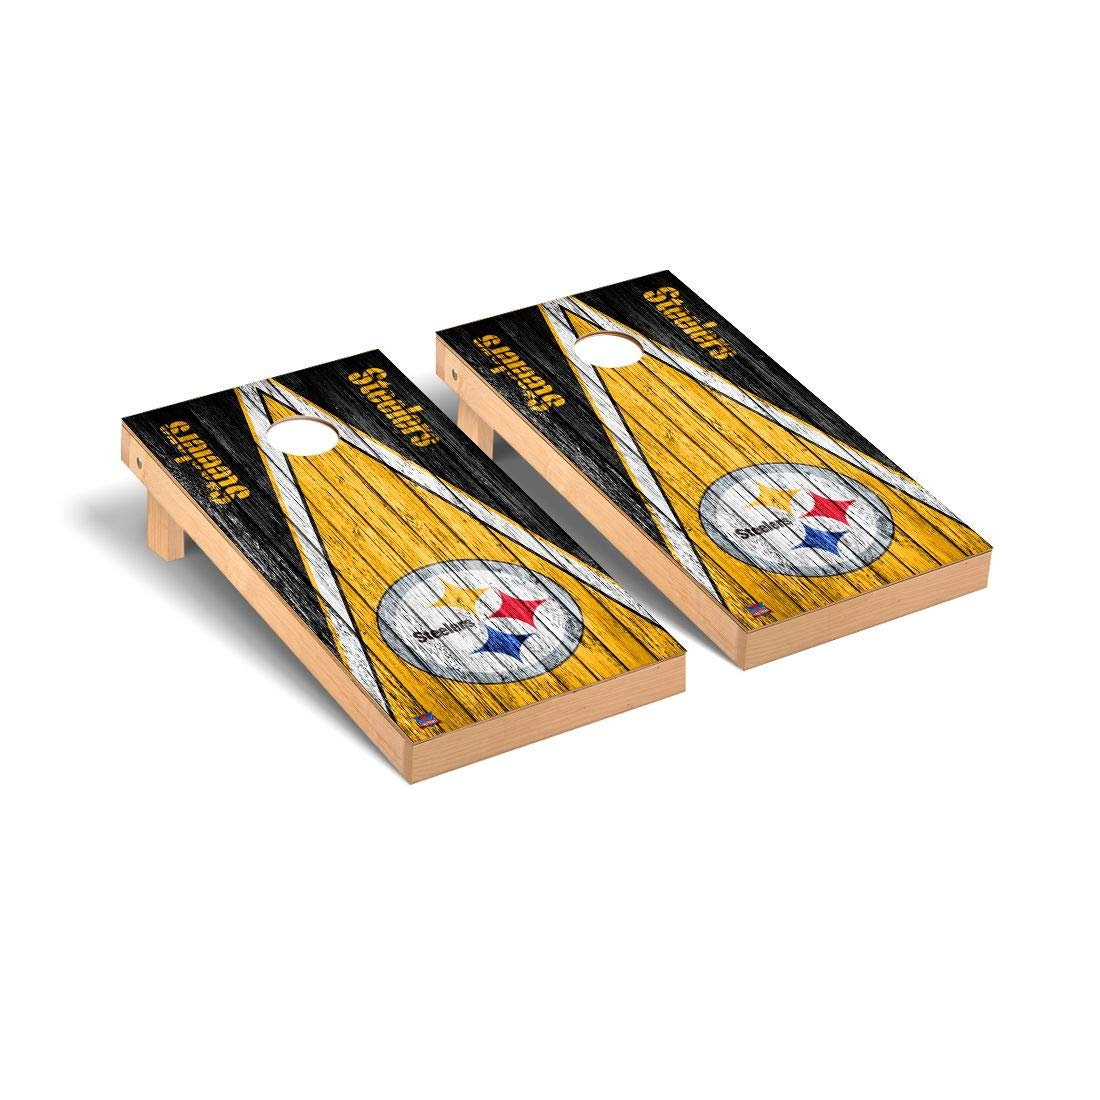 NFL Pittsburgh Steelers風化三角形バージョンFootball Corn穴ゲームセット、1サイズ   B01N1YIAP6